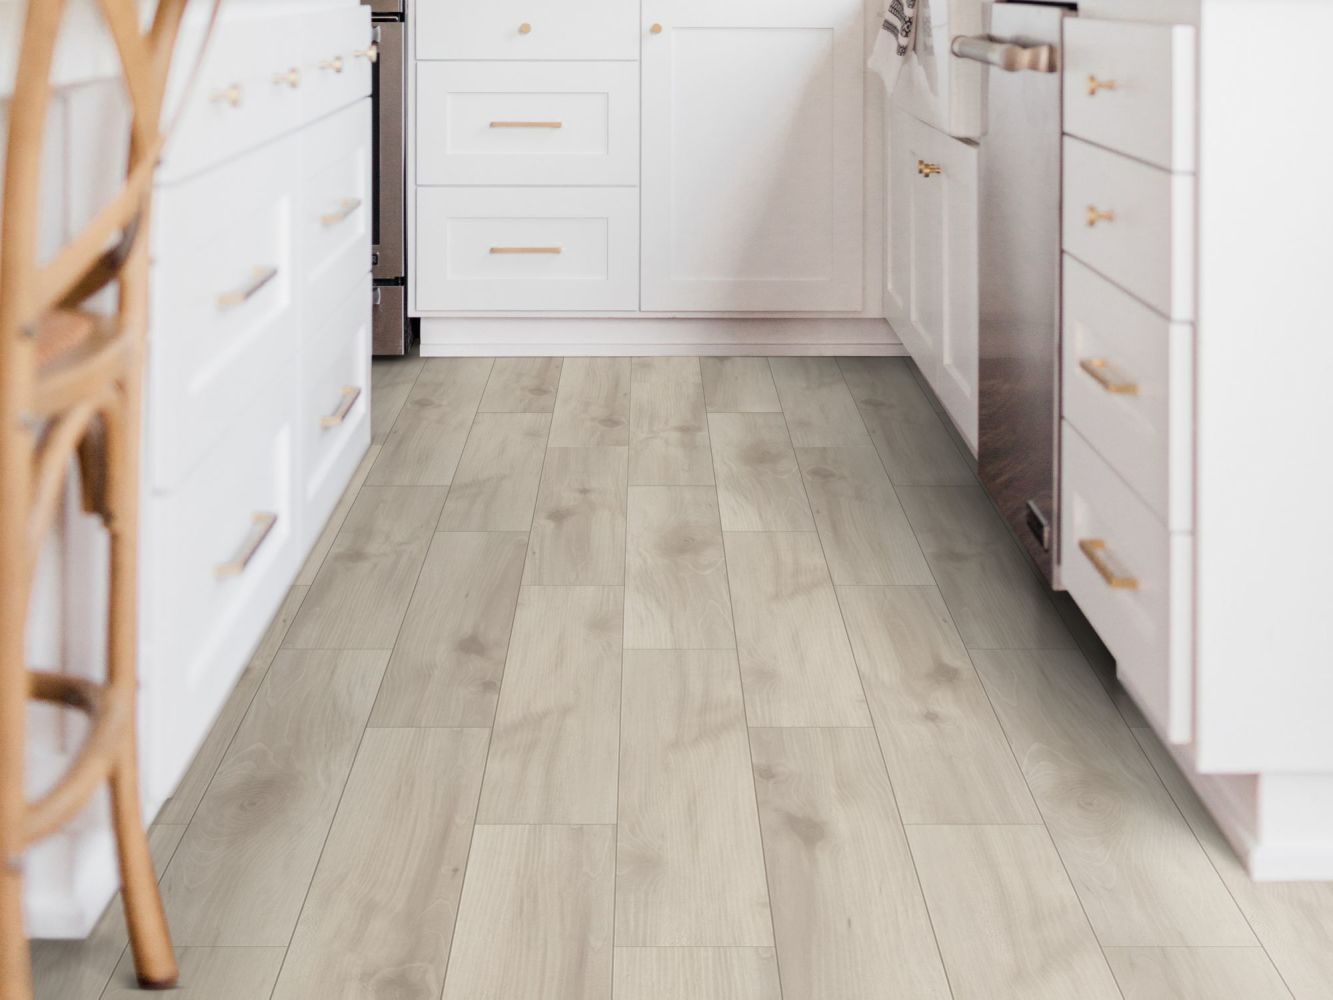 Shaw Floors Versalock Laminate Intrigue Puttied Walnut 01028_SL448